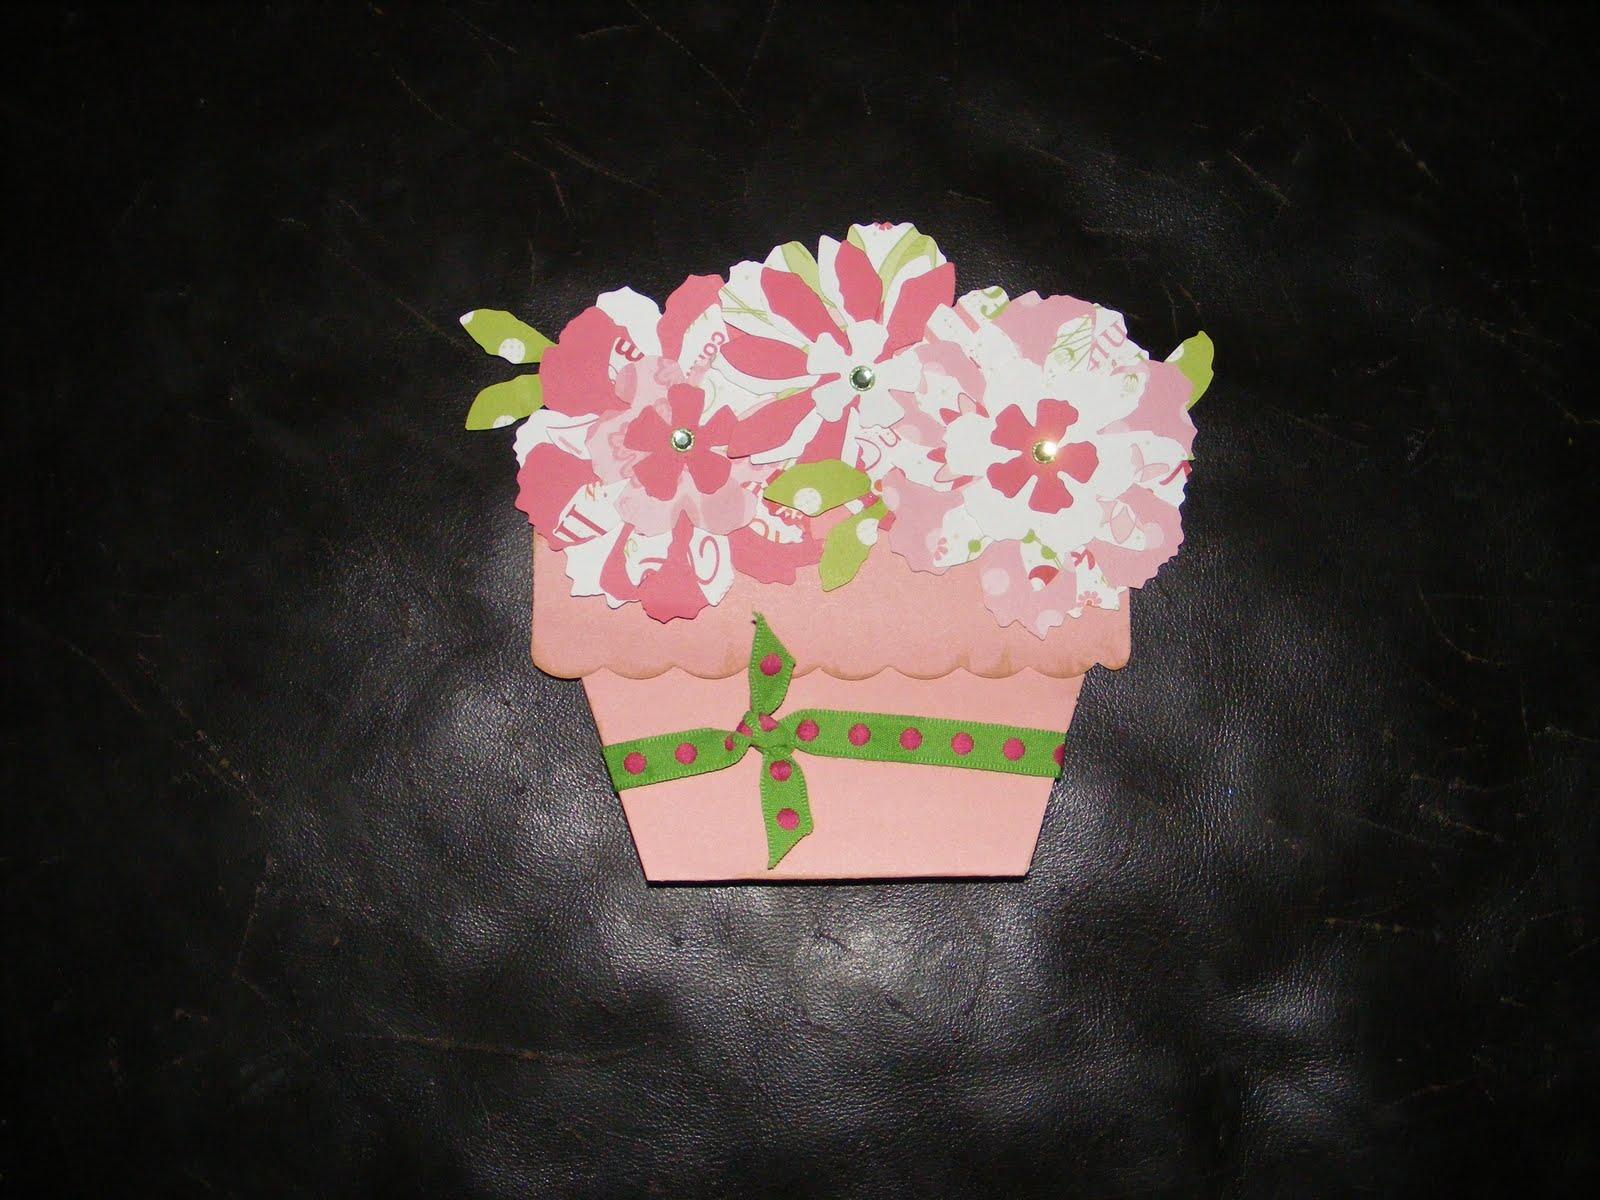 Funny Quotes Contact Us DMCA Notice: quoteko.com/happy-birthday-irma-free-cards.html